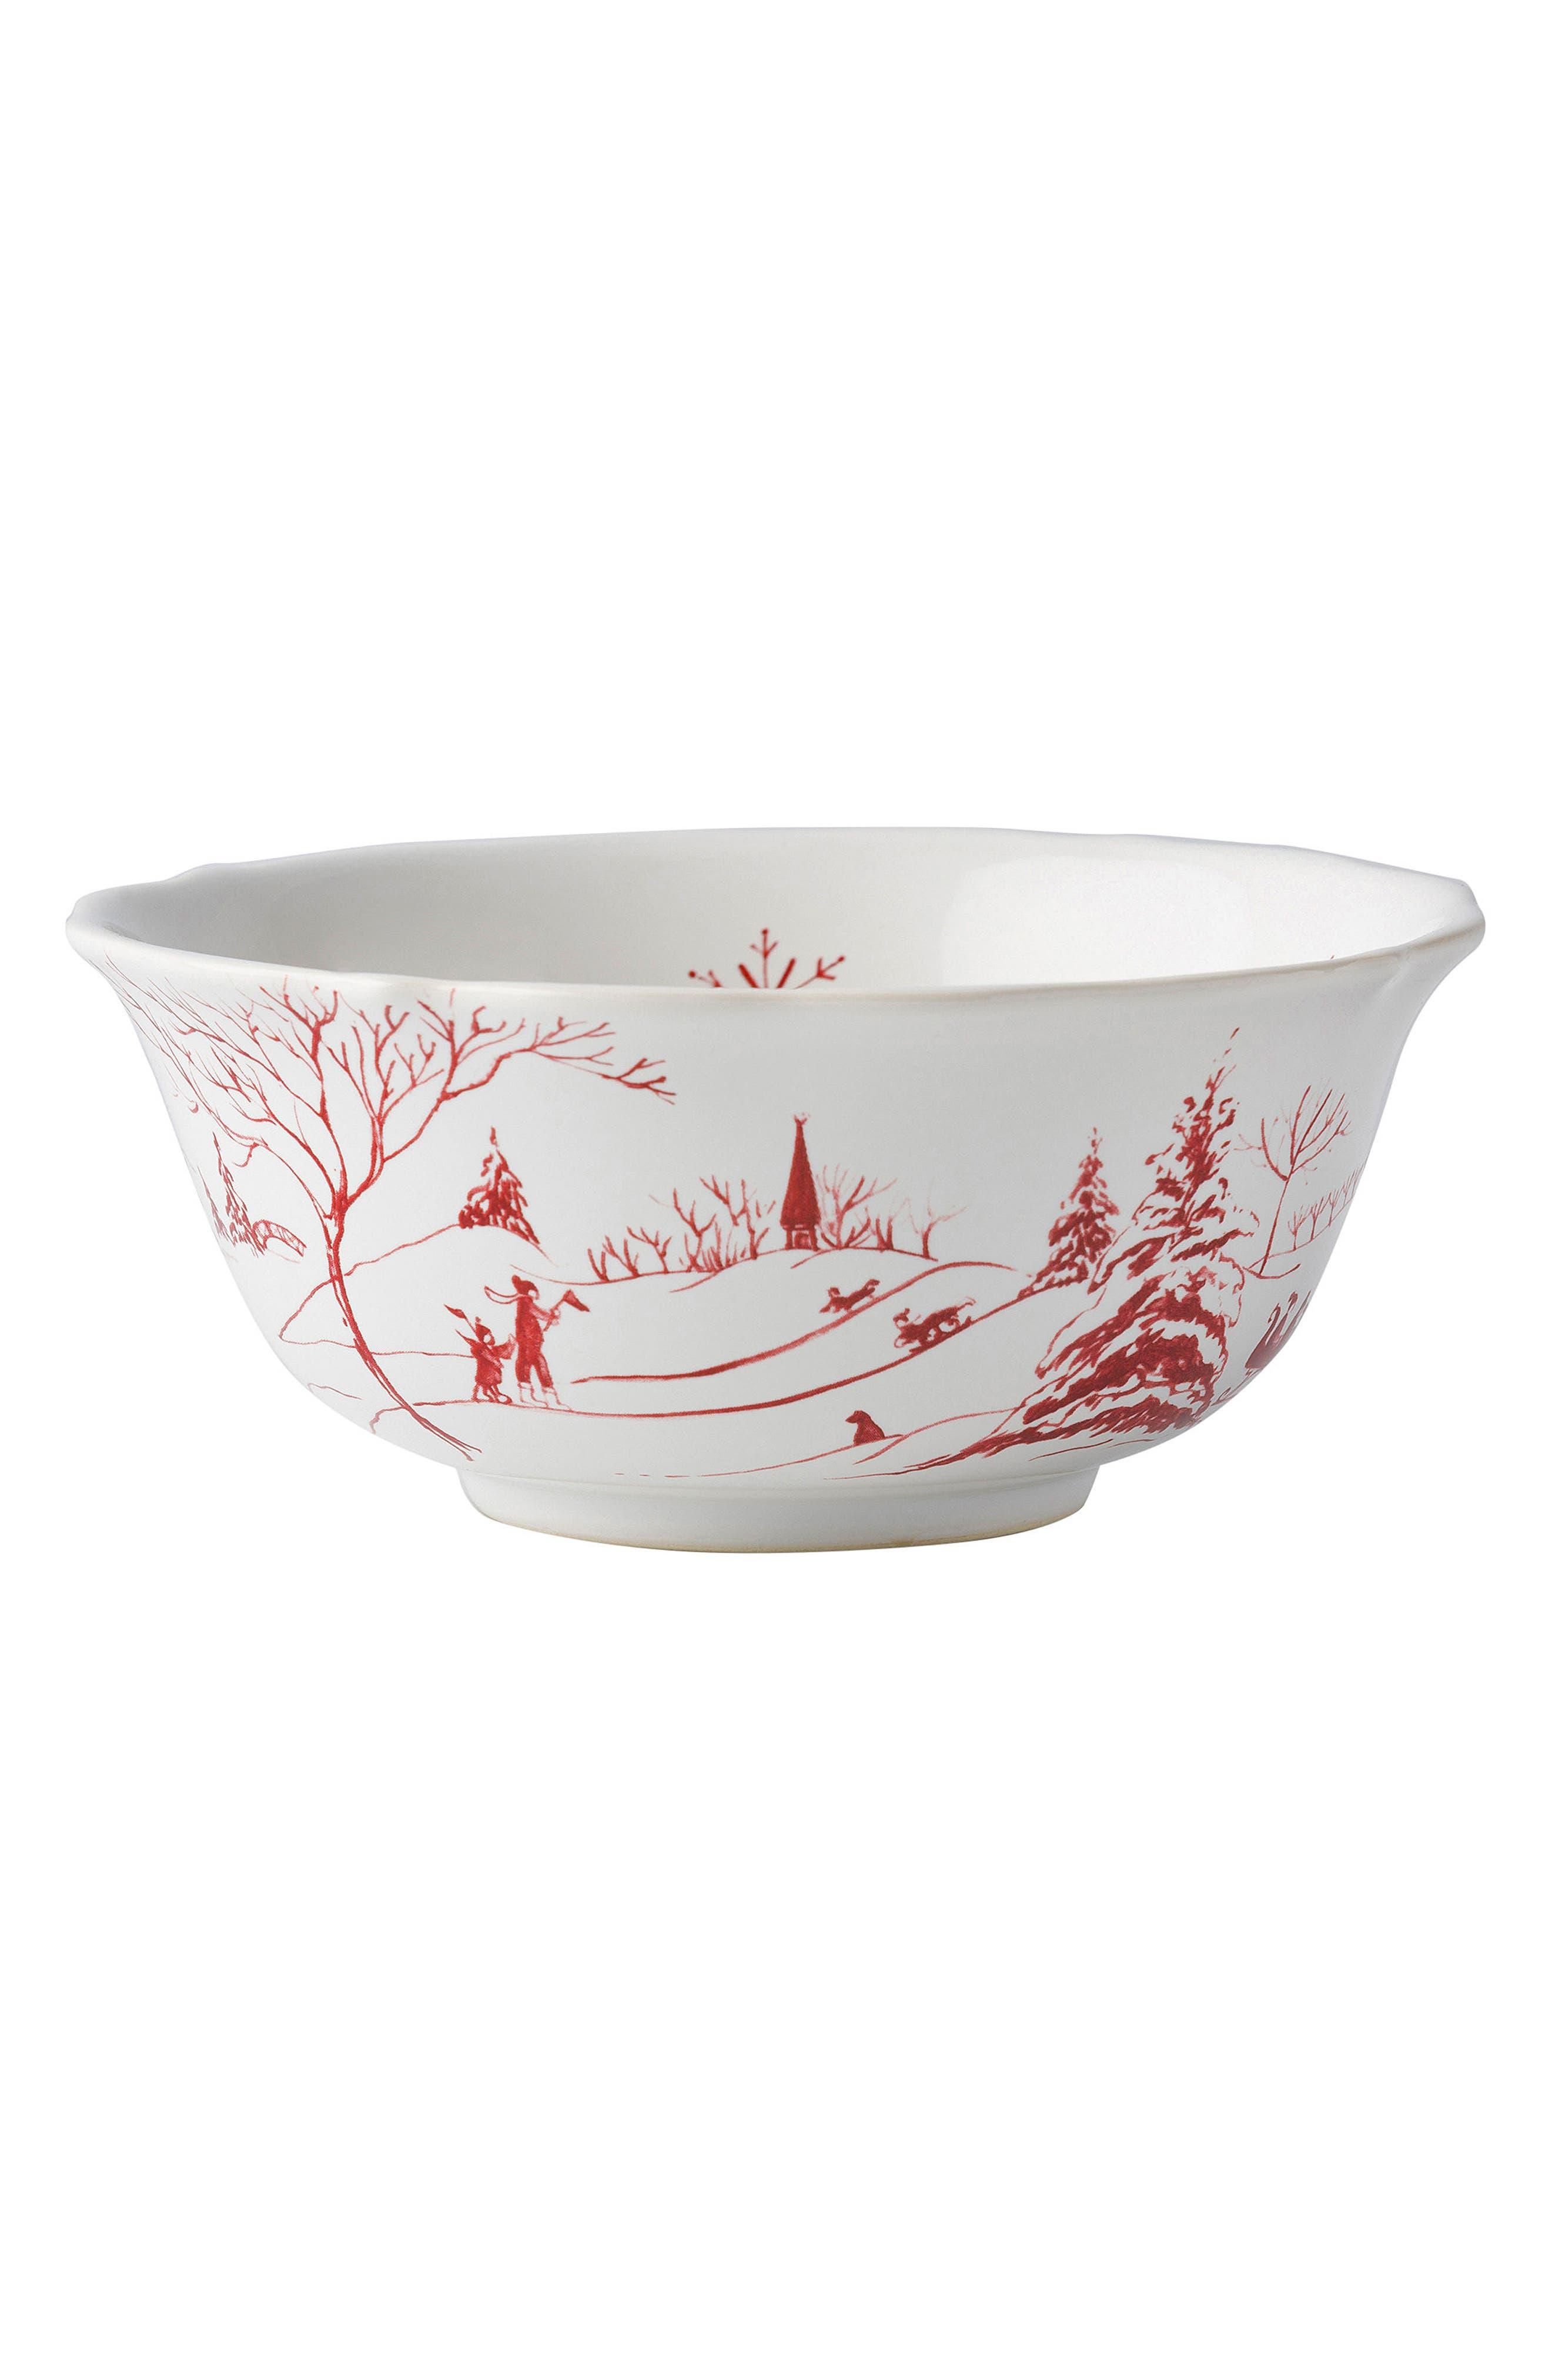 Main Image - Juliska Winter Frolic Ceramic Cereal Bowl